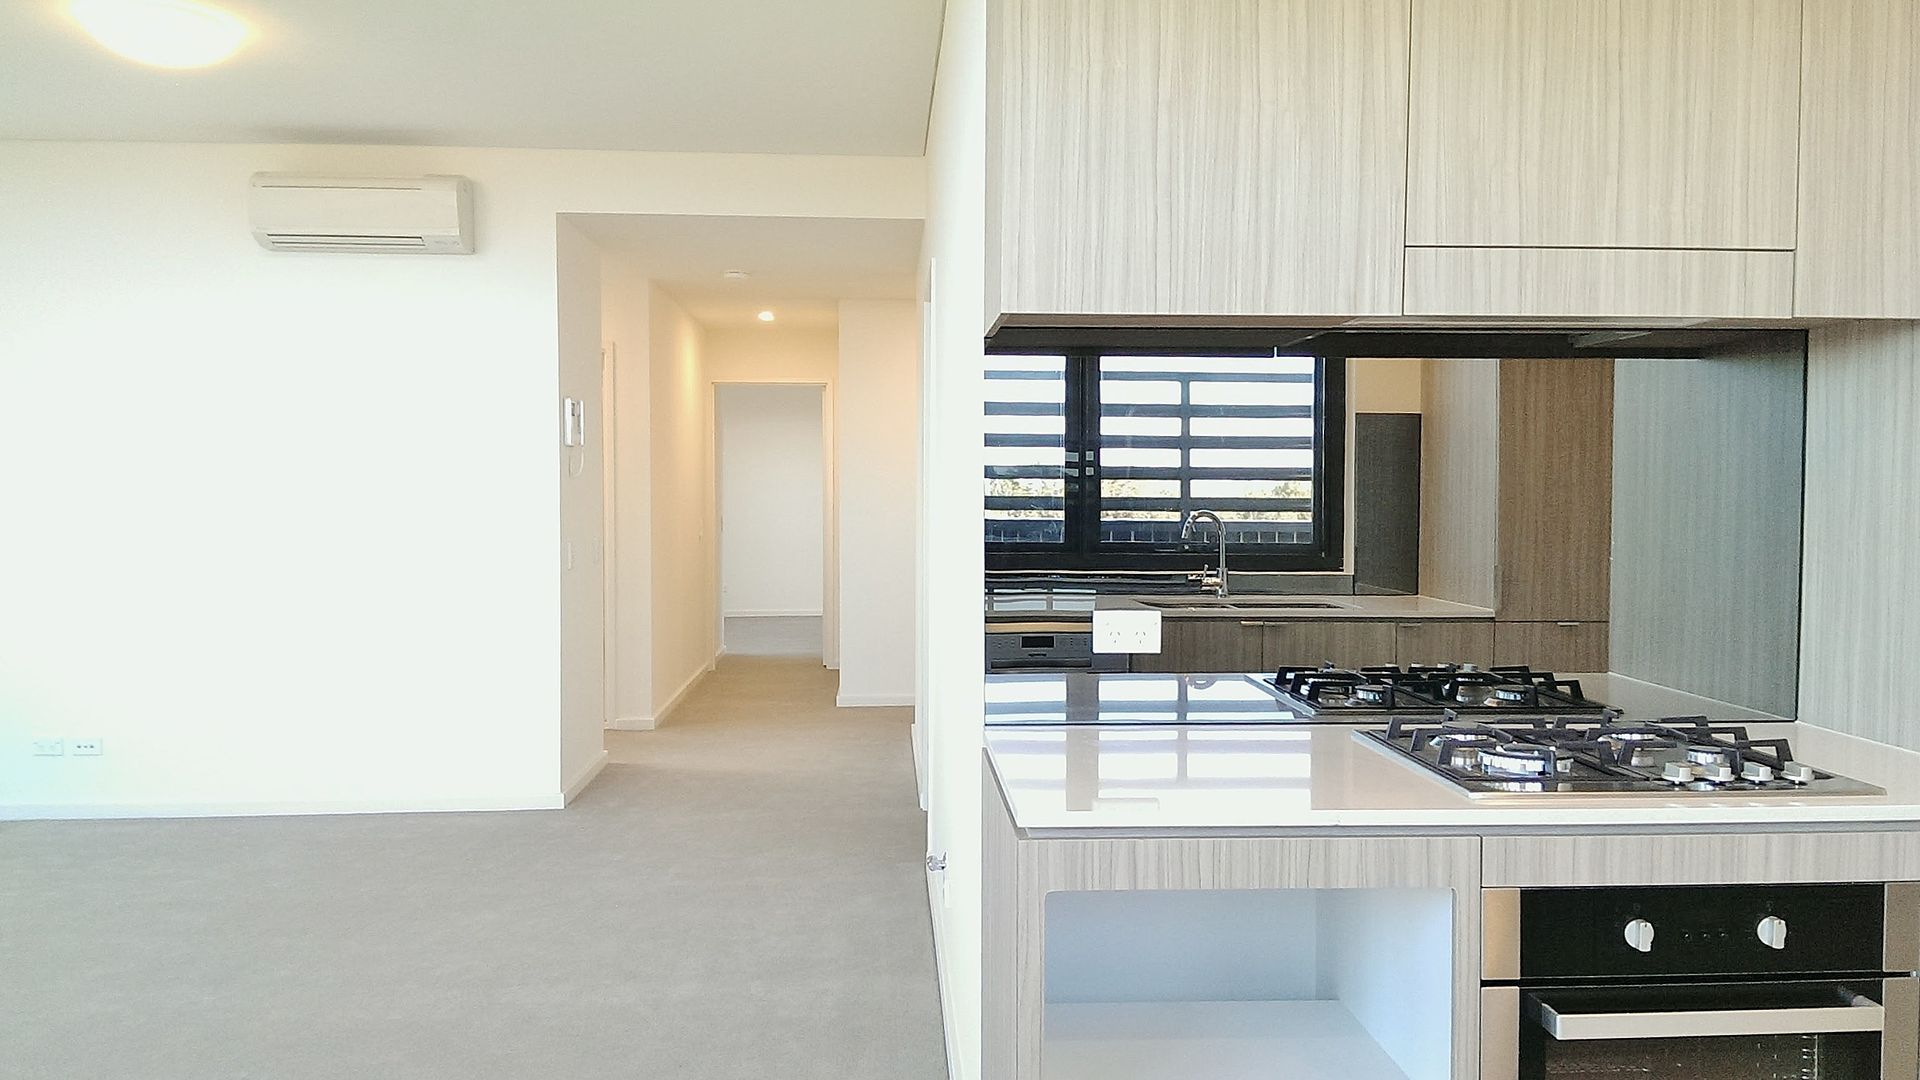 37/1-3 Werombi Road, Mount Colah NSW 2079, Image 9